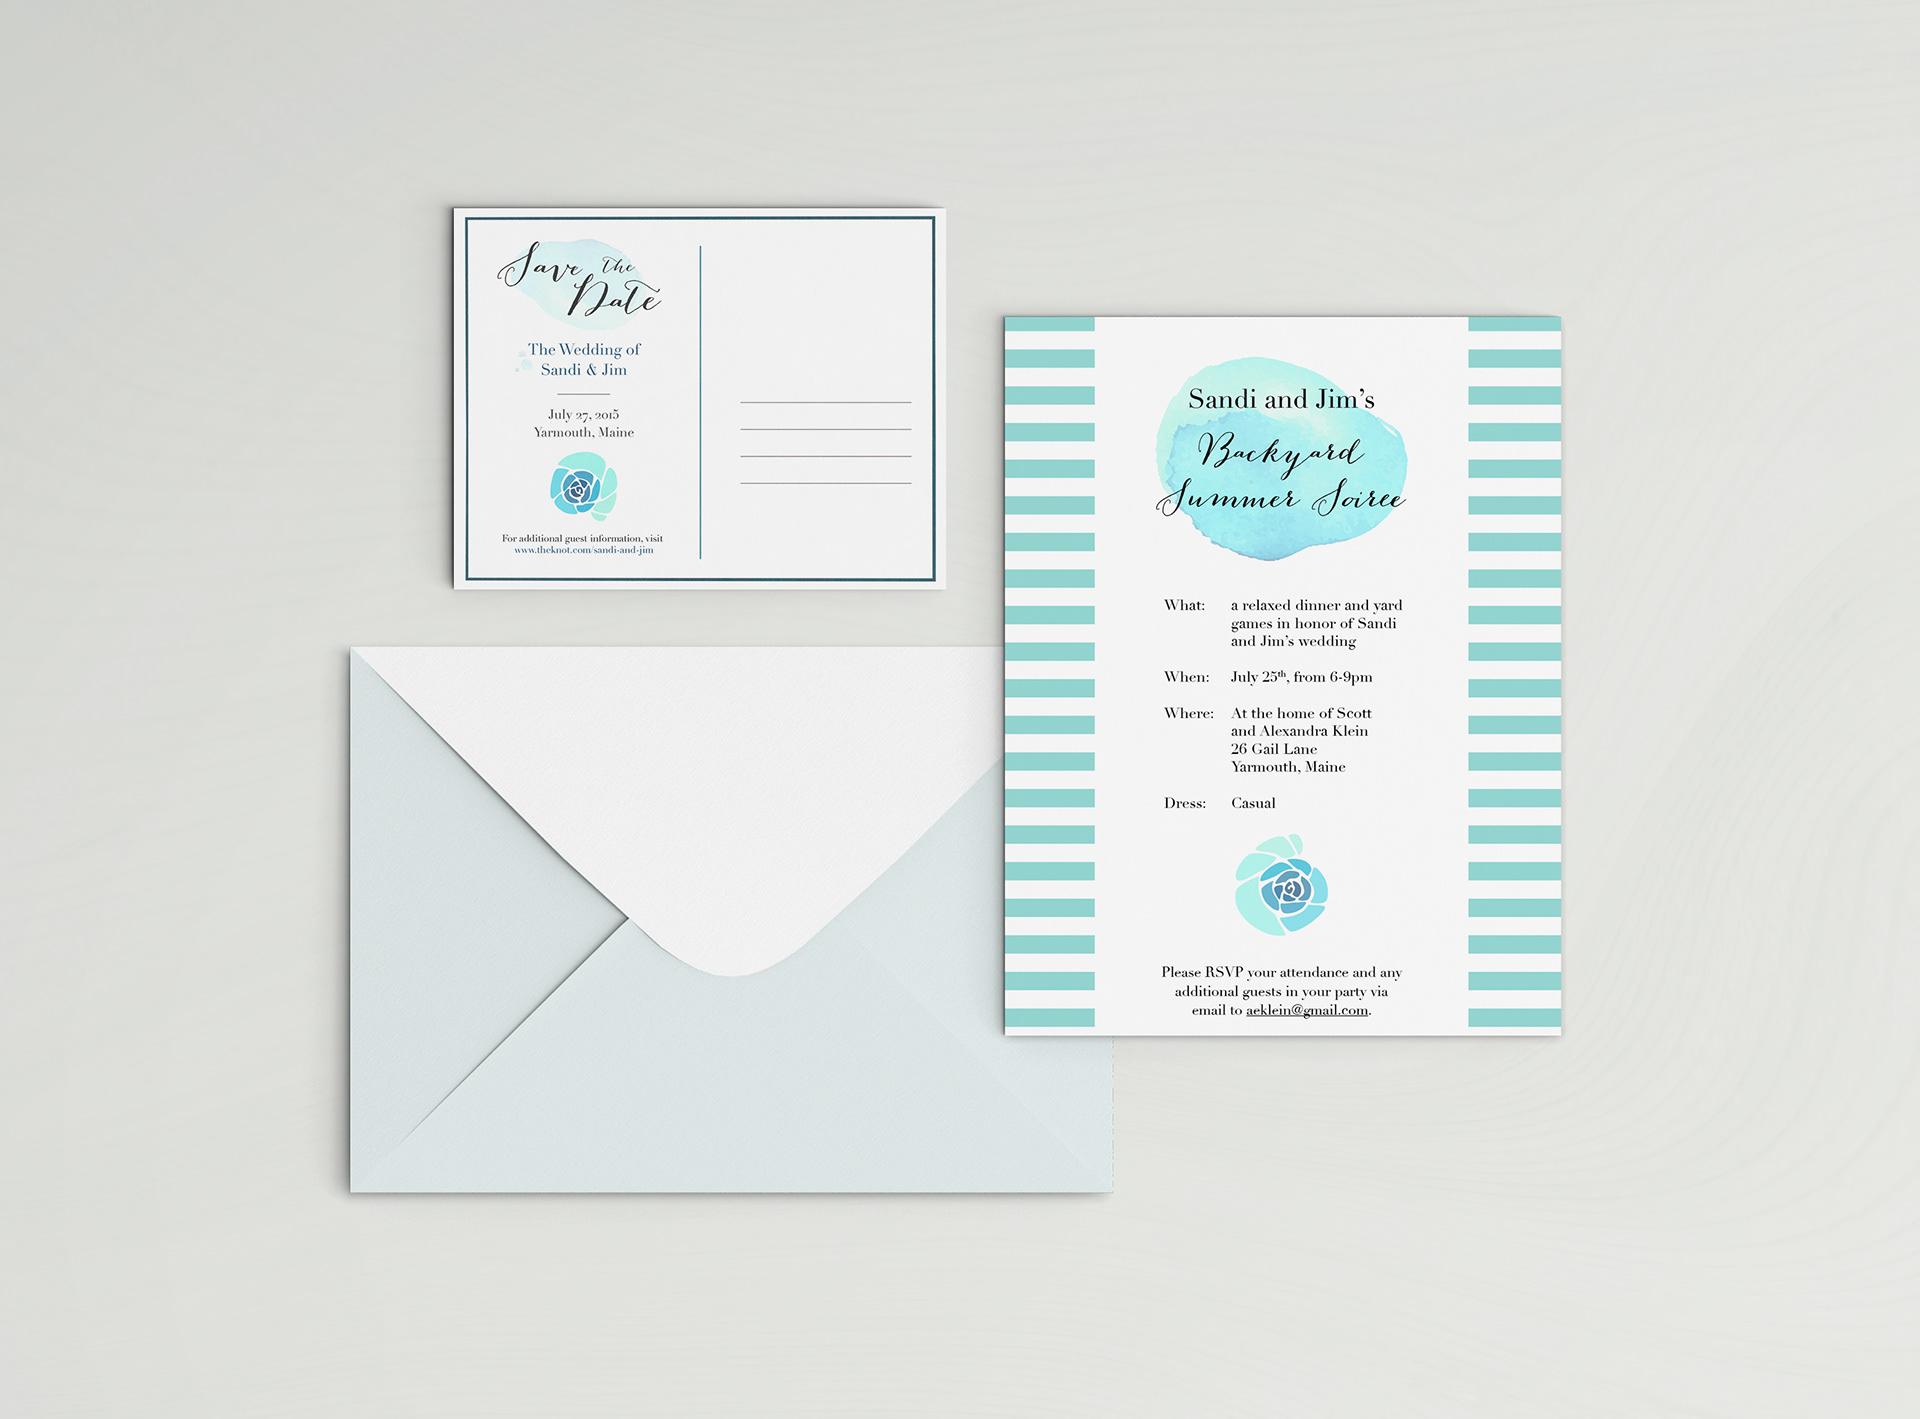 meaghan sandtorv design portfolio wedding reception invitation